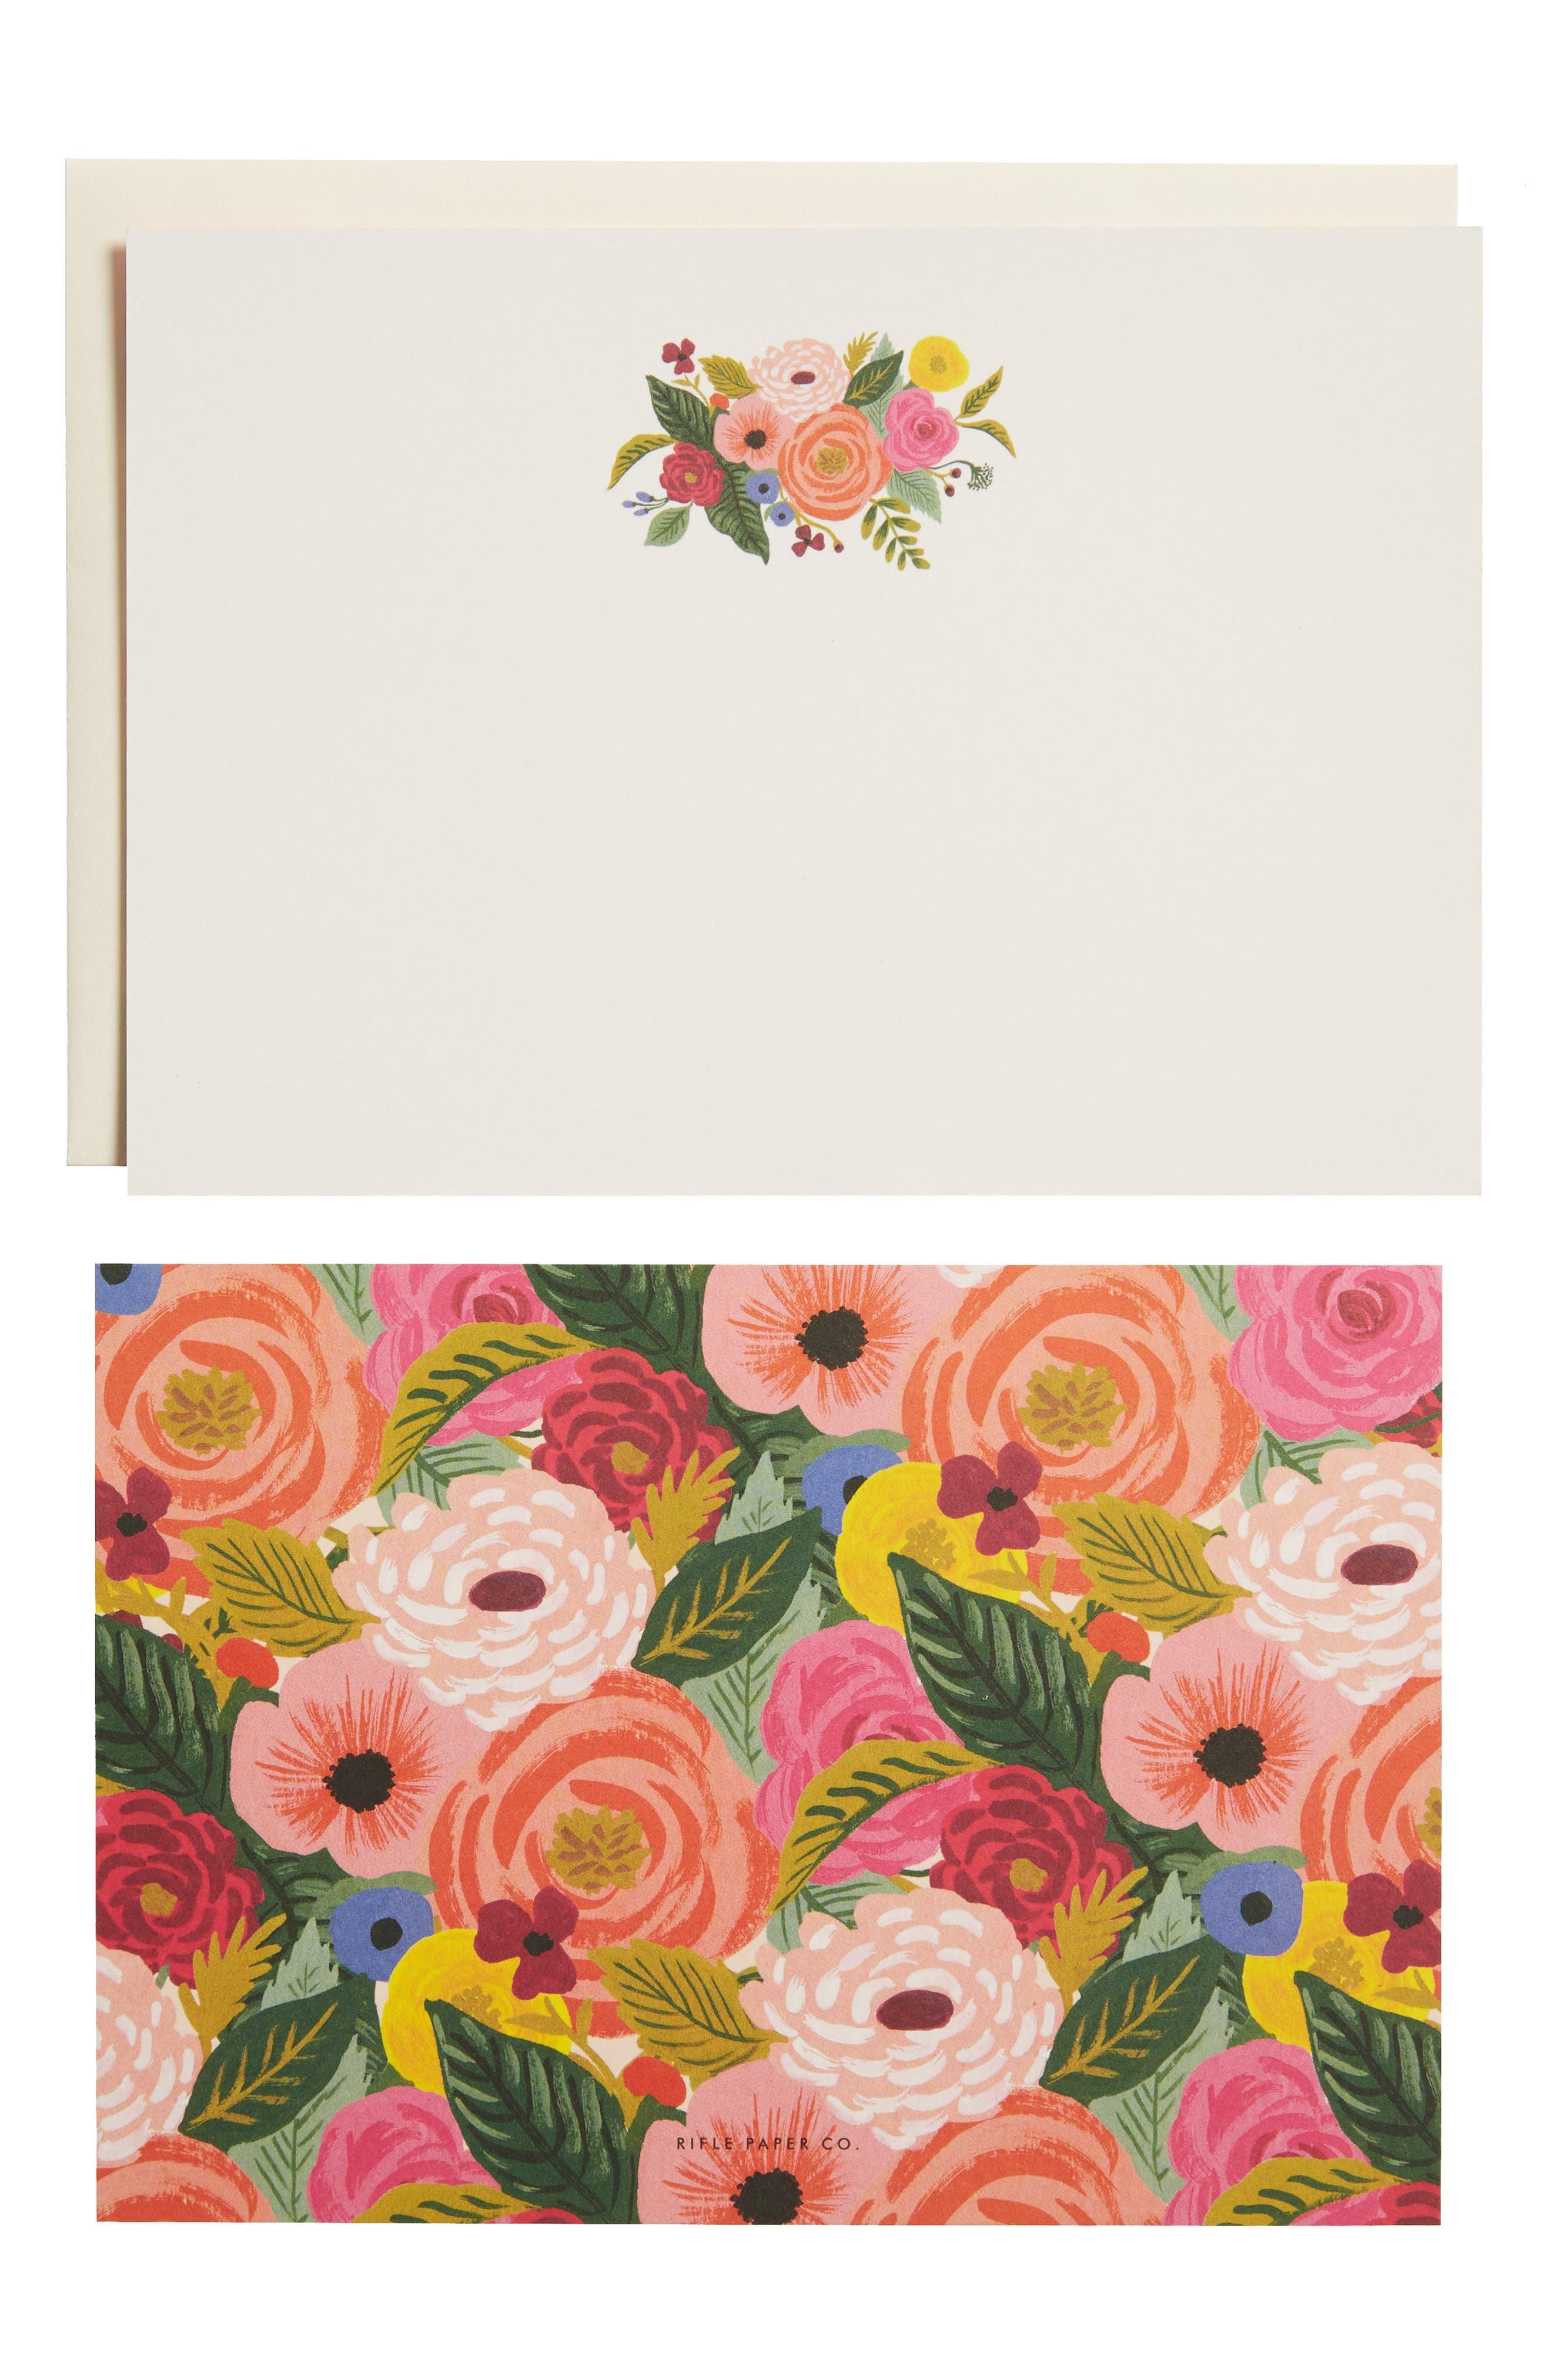 Juliet Rose Social Stationery 12-Pack Note Cards & Envelopes,                             Main thumbnail 1, color,                             300